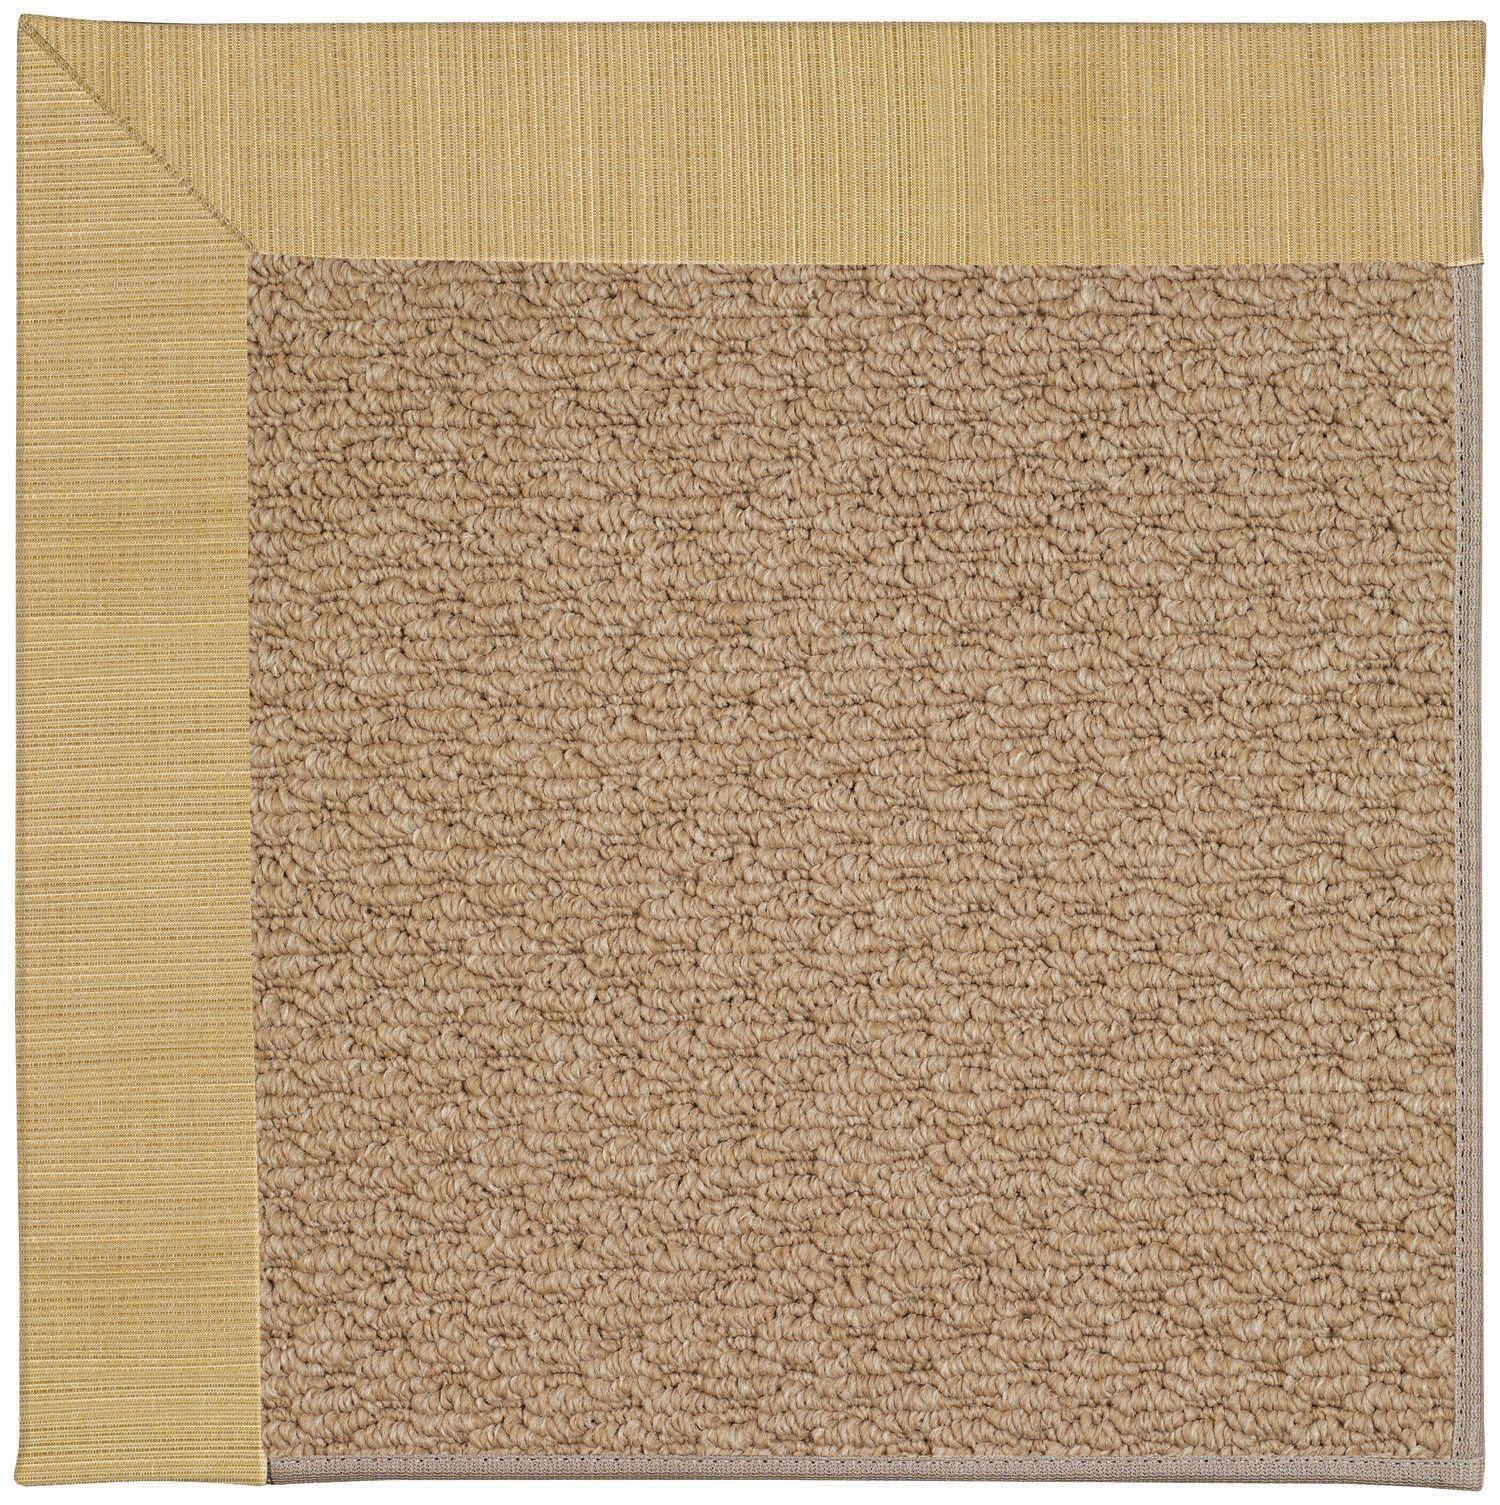 Lisle Machine Tufted Bramble Indoor/Outdoor Area Rug Rug Size: Square 10'